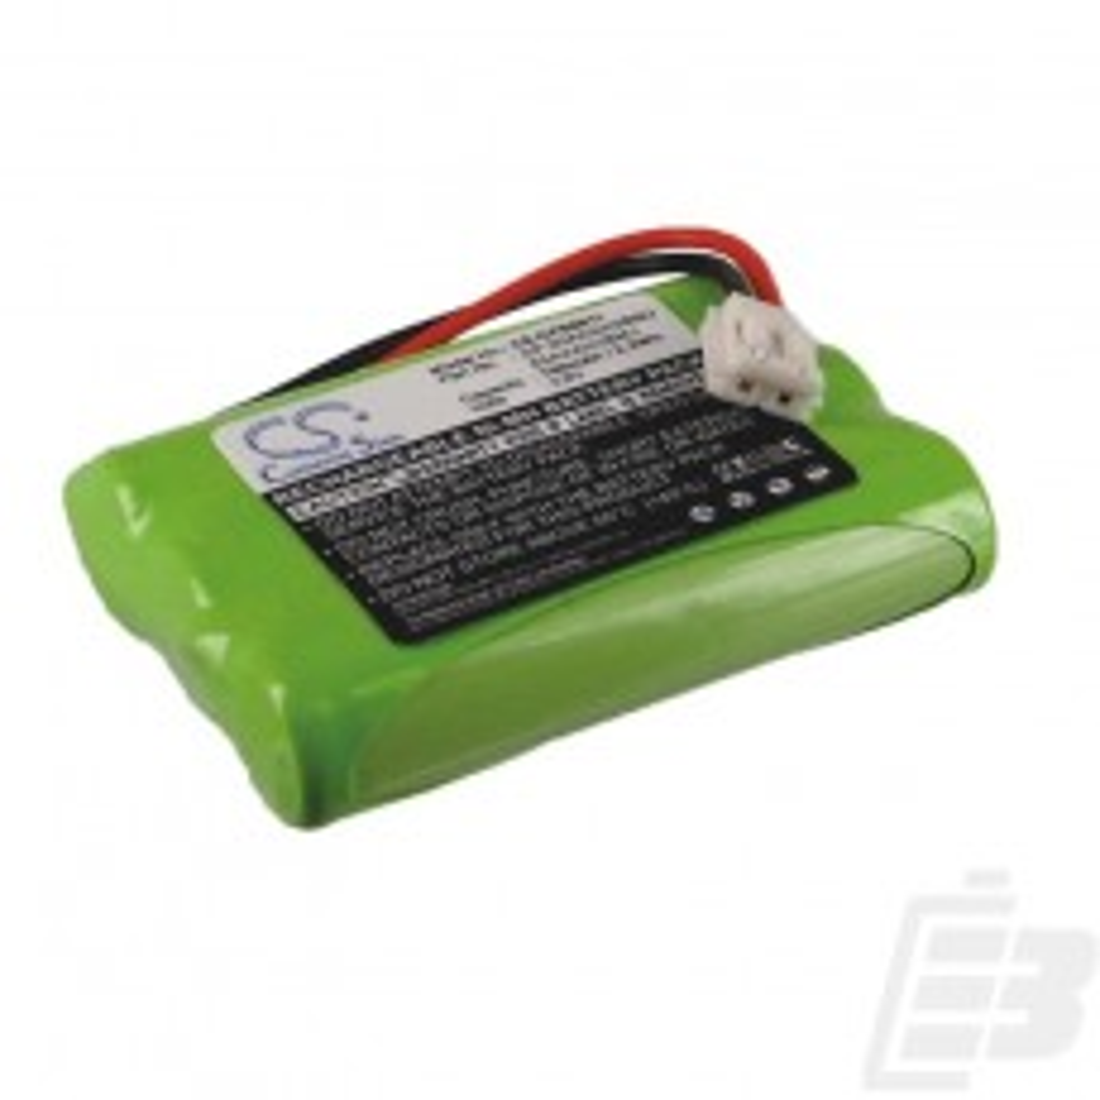 Cordless phone battery Uniden 5822_1